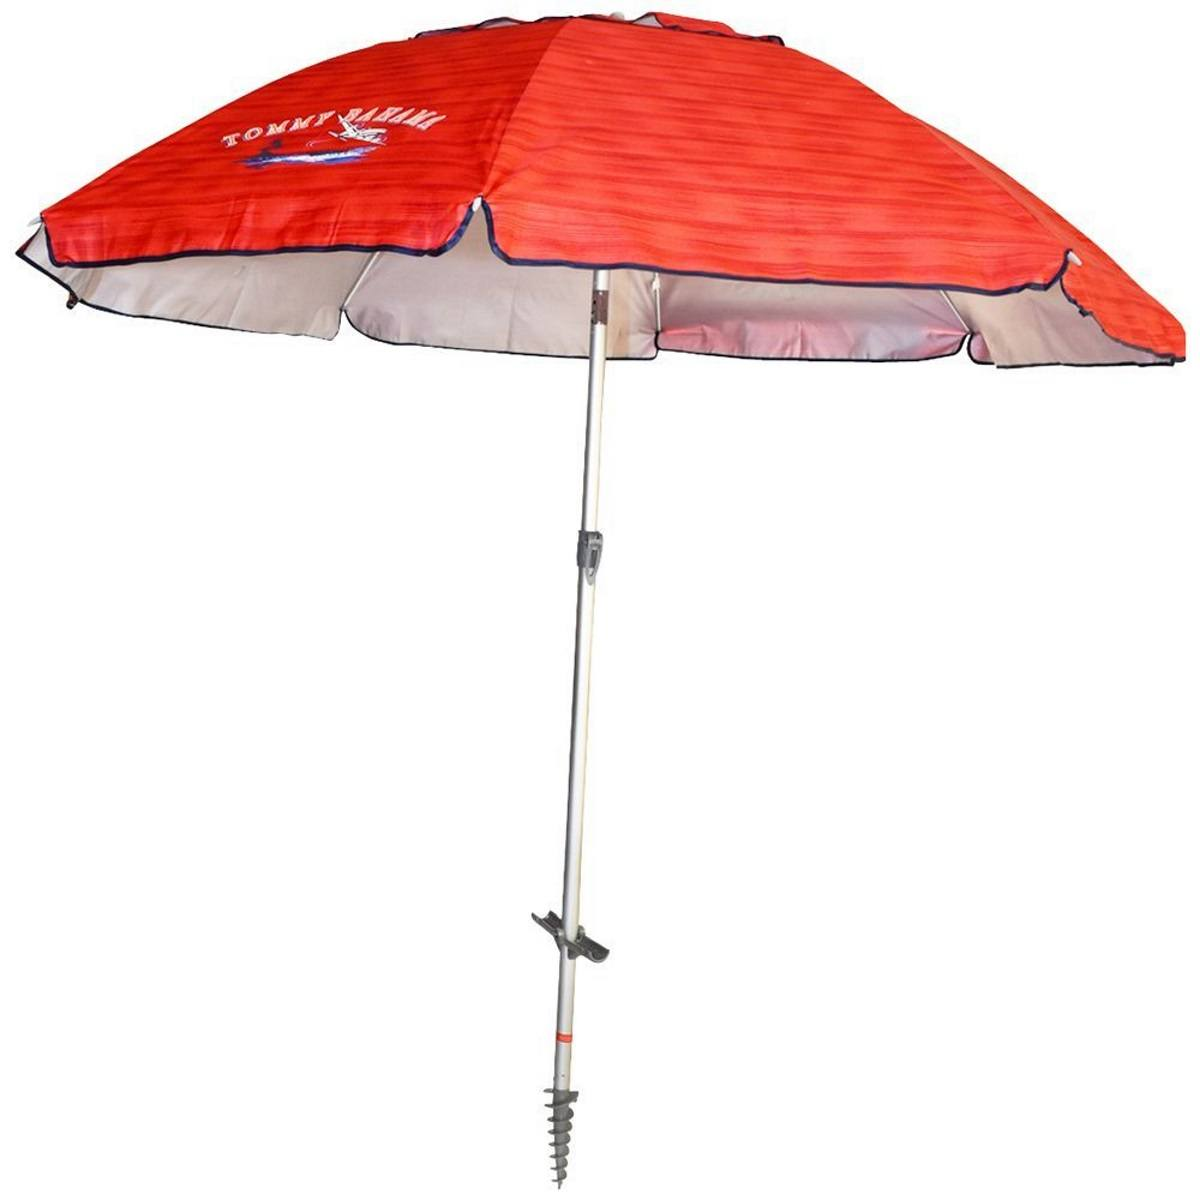 Tommy Bahama 7 Ft Sun Blocking Beach Umbrella With Tilt And